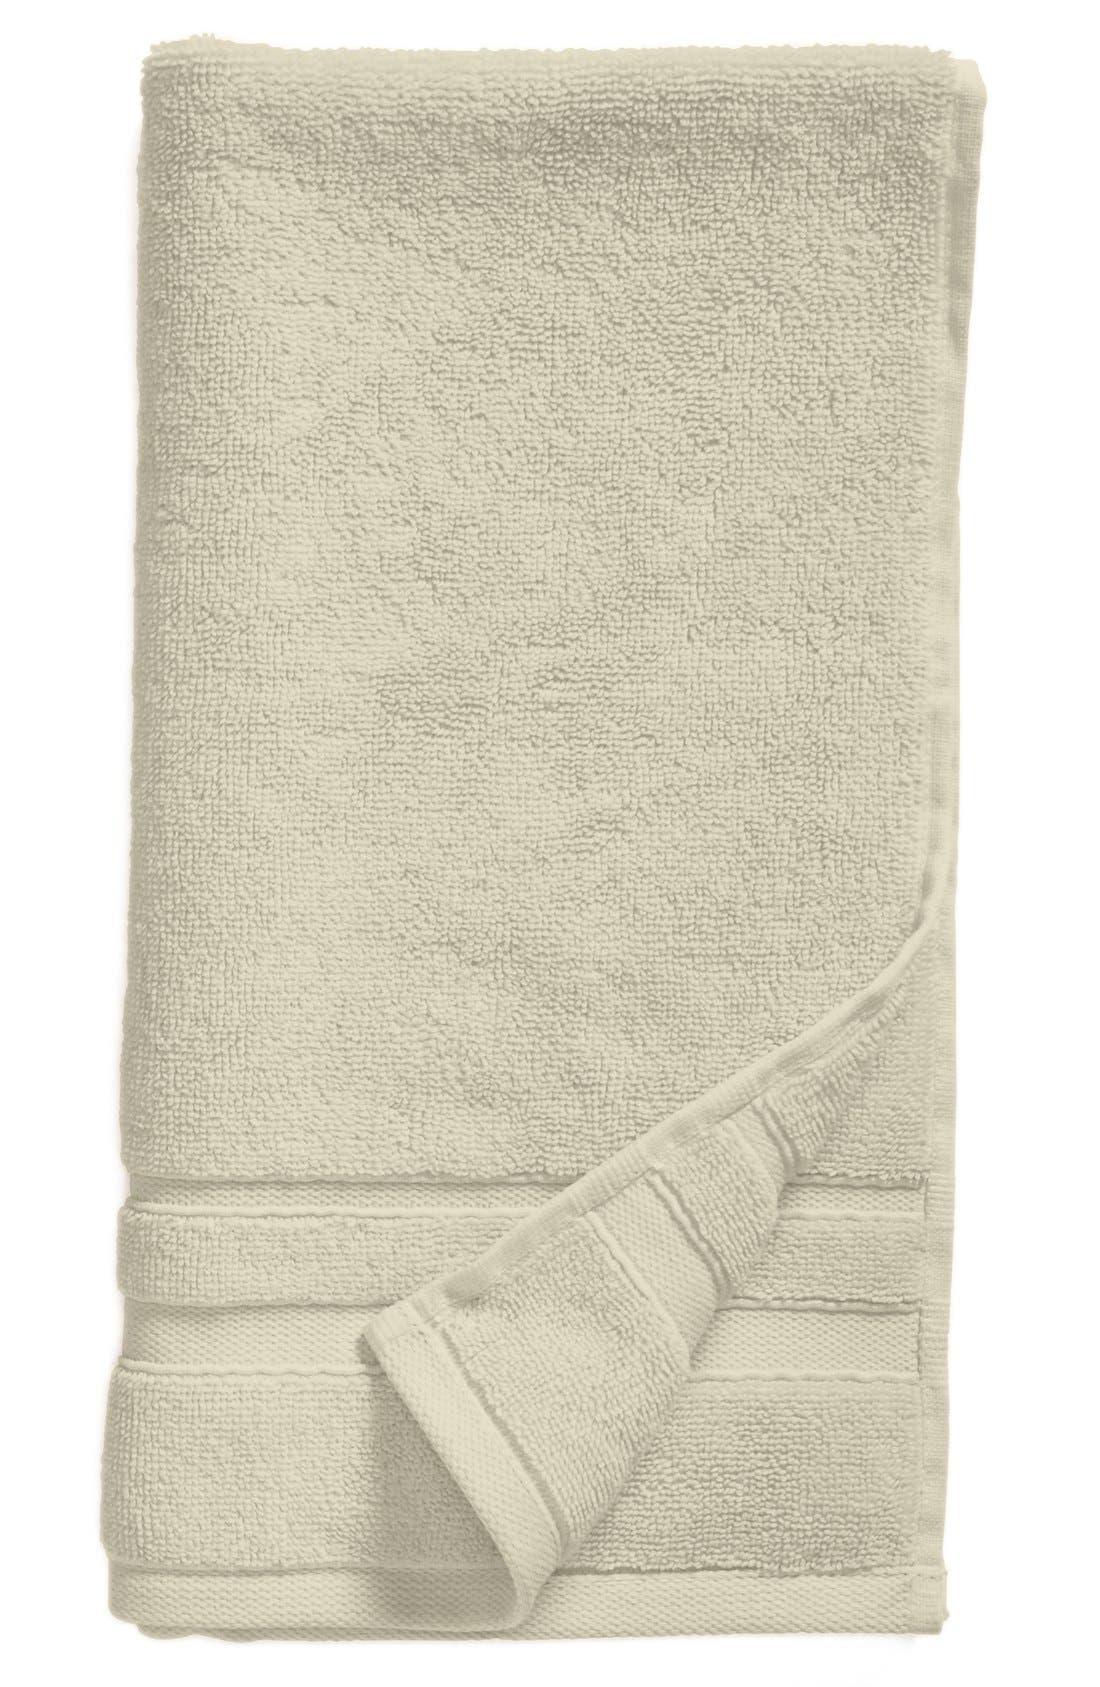 Waterworks Studio 'Perennial' Combed Turkish Cotton Hand Towel (Online Only)